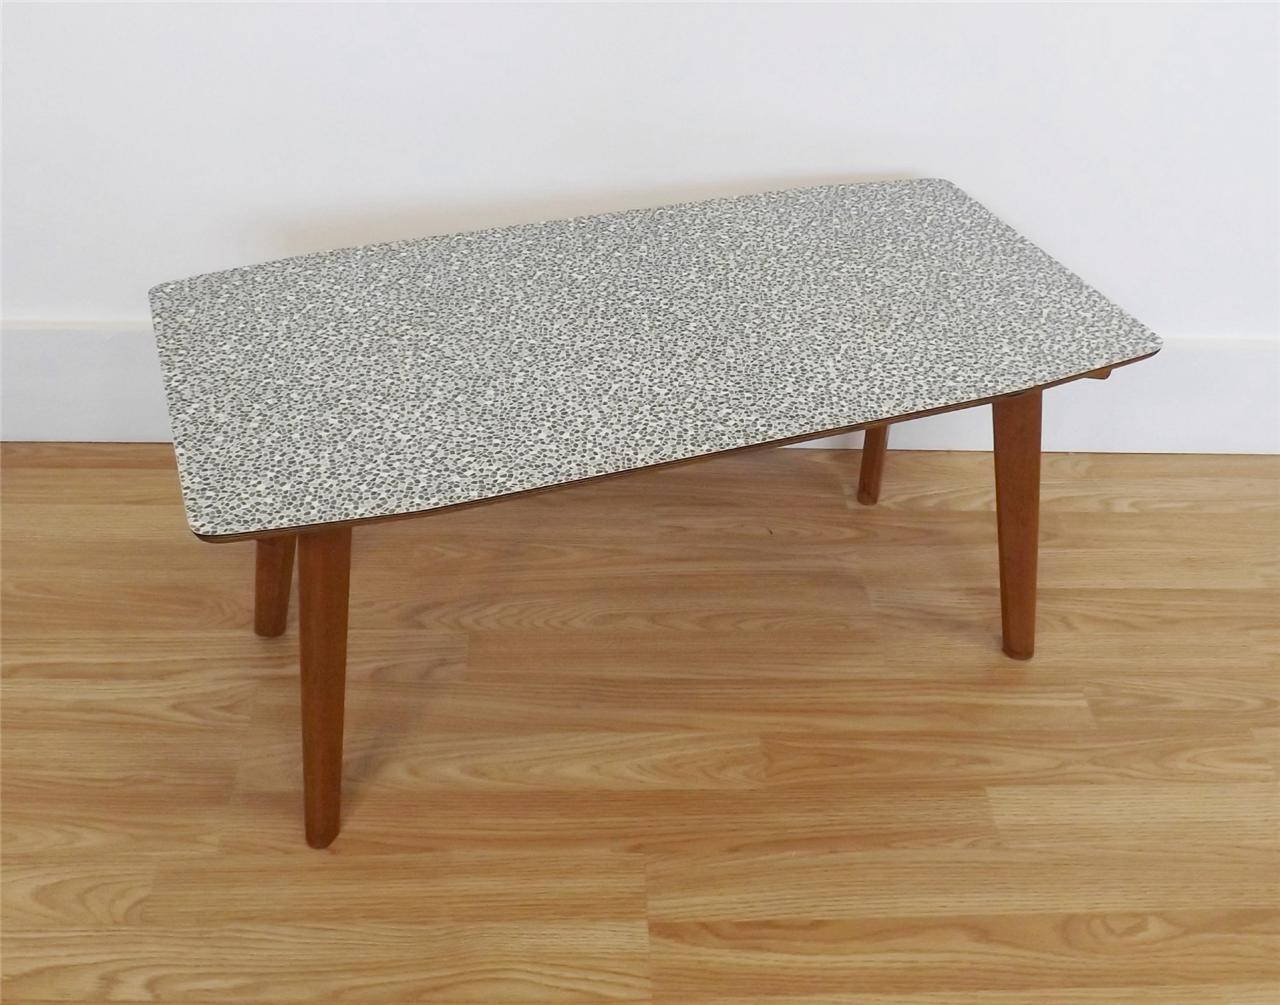 formica coffee table retro vintage mid century atomic 50s. Black Bedroom Furniture Sets. Home Design Ideas